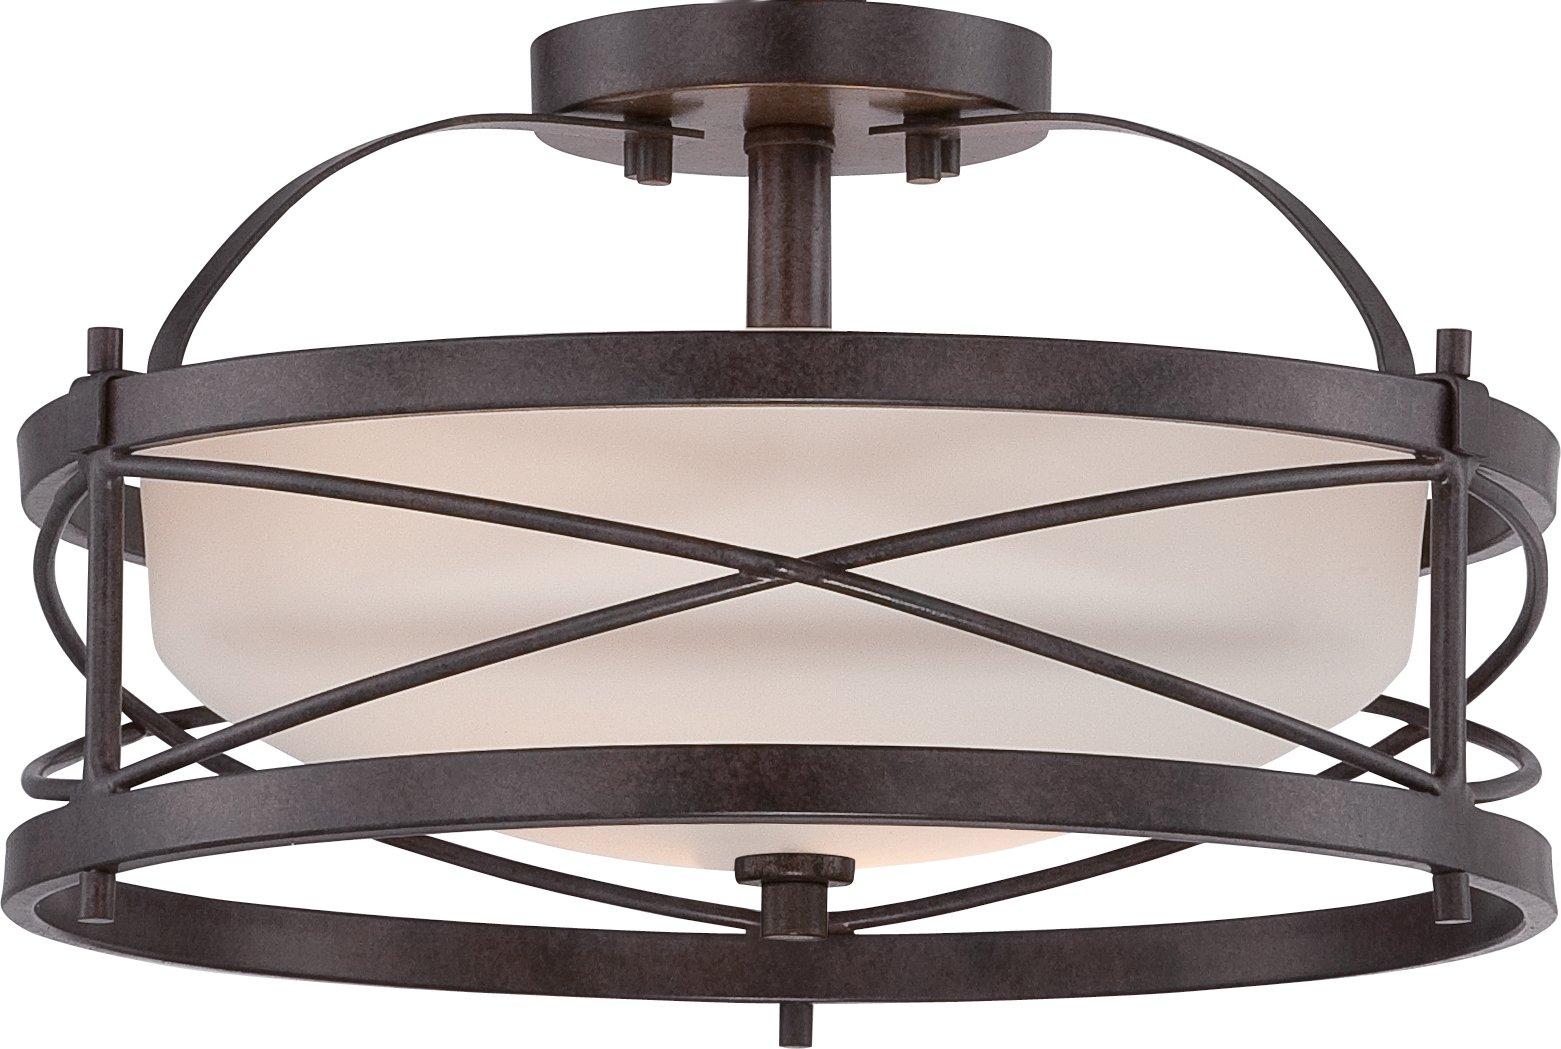 Nuvo Lighting 60/5335 Two Light Semi Flush Mount, 14'' W x 8.25'' H Bronze/Dark